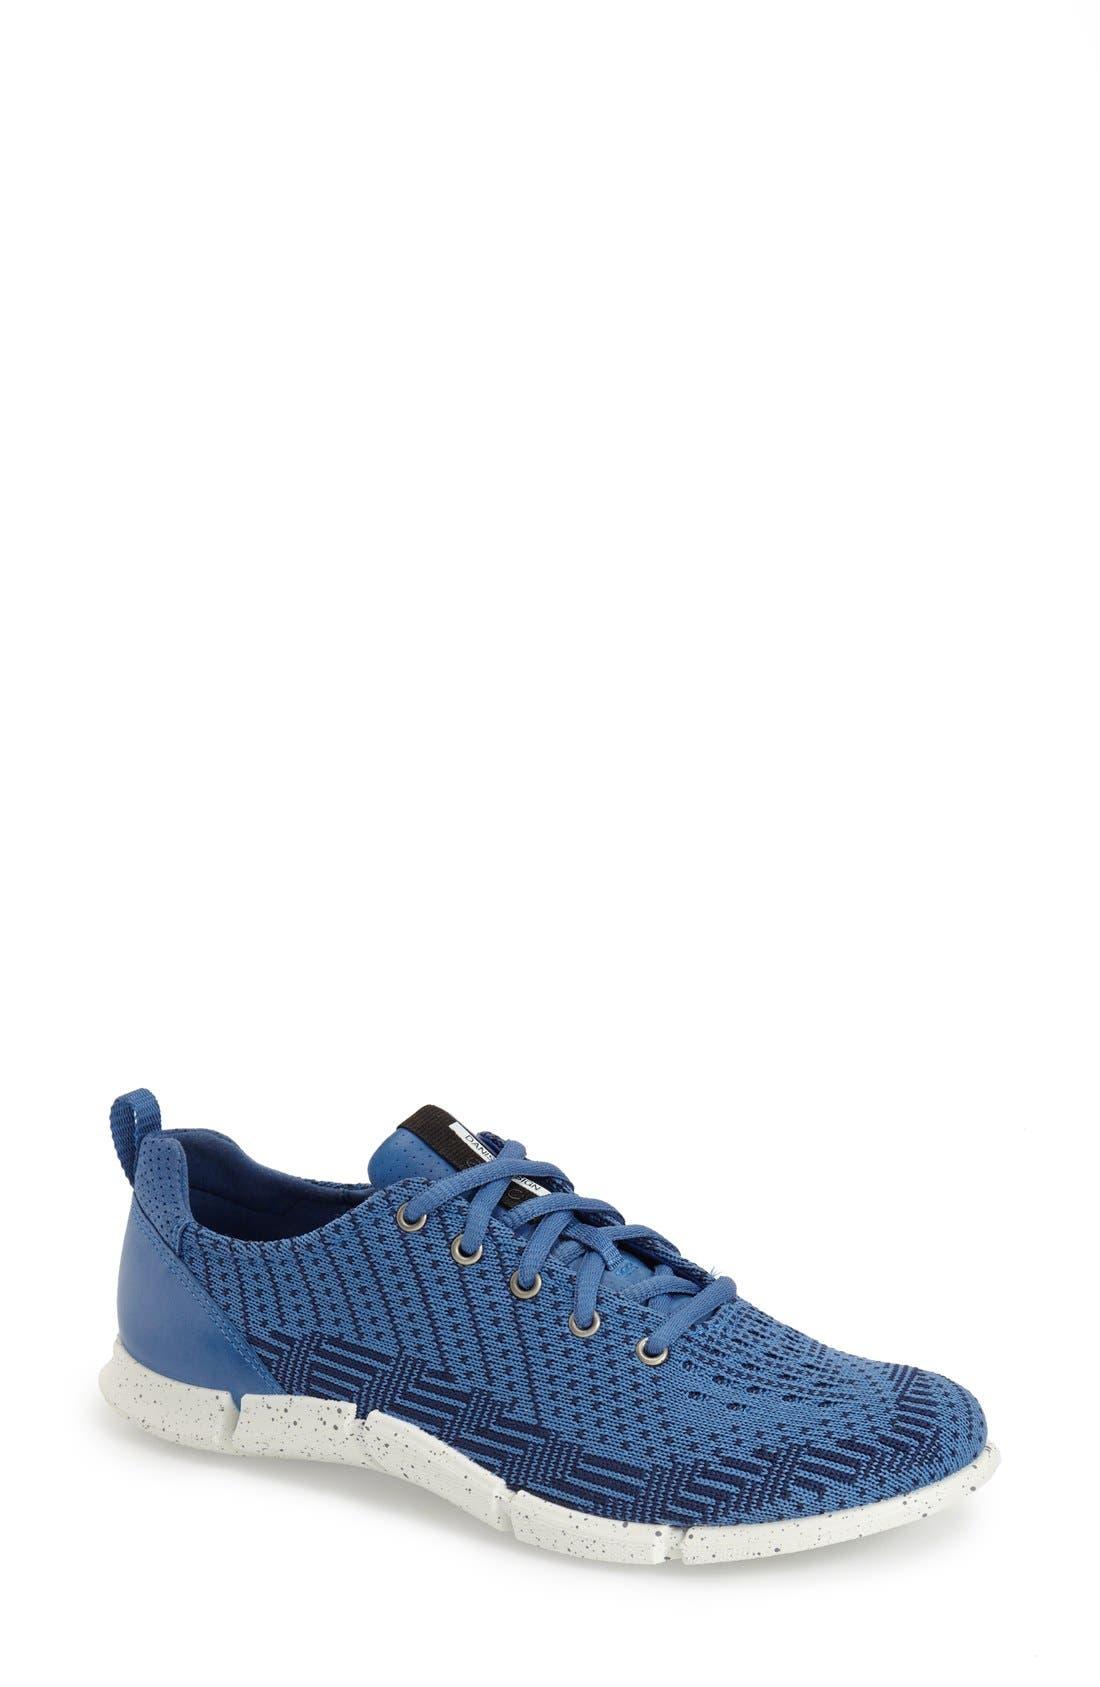 ECCO 'Intrinsic Knit' Sneaker